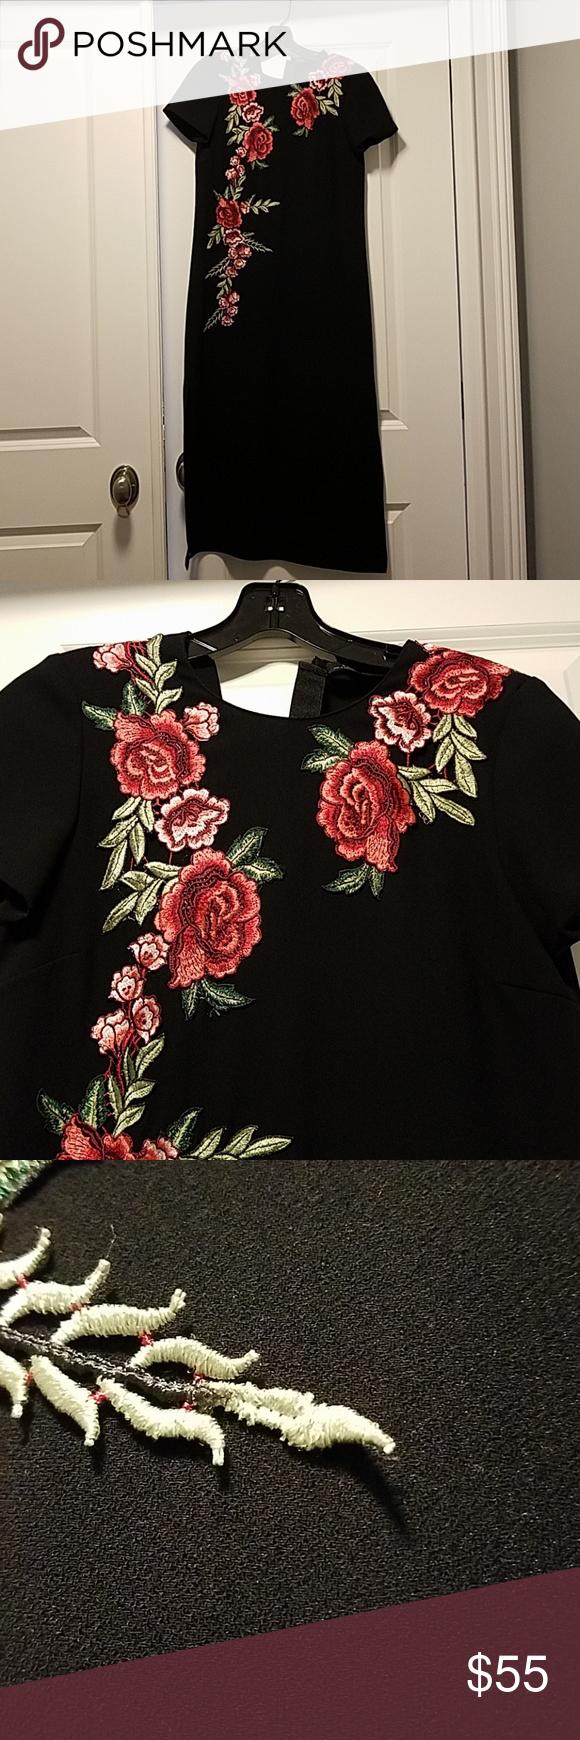 Zara Midi Rose Floral Embroidered Dress Sz S Floral Embroidered Dress Rose Embroidered Dress Clothes Design [ 1740 x 580 Pixel ]